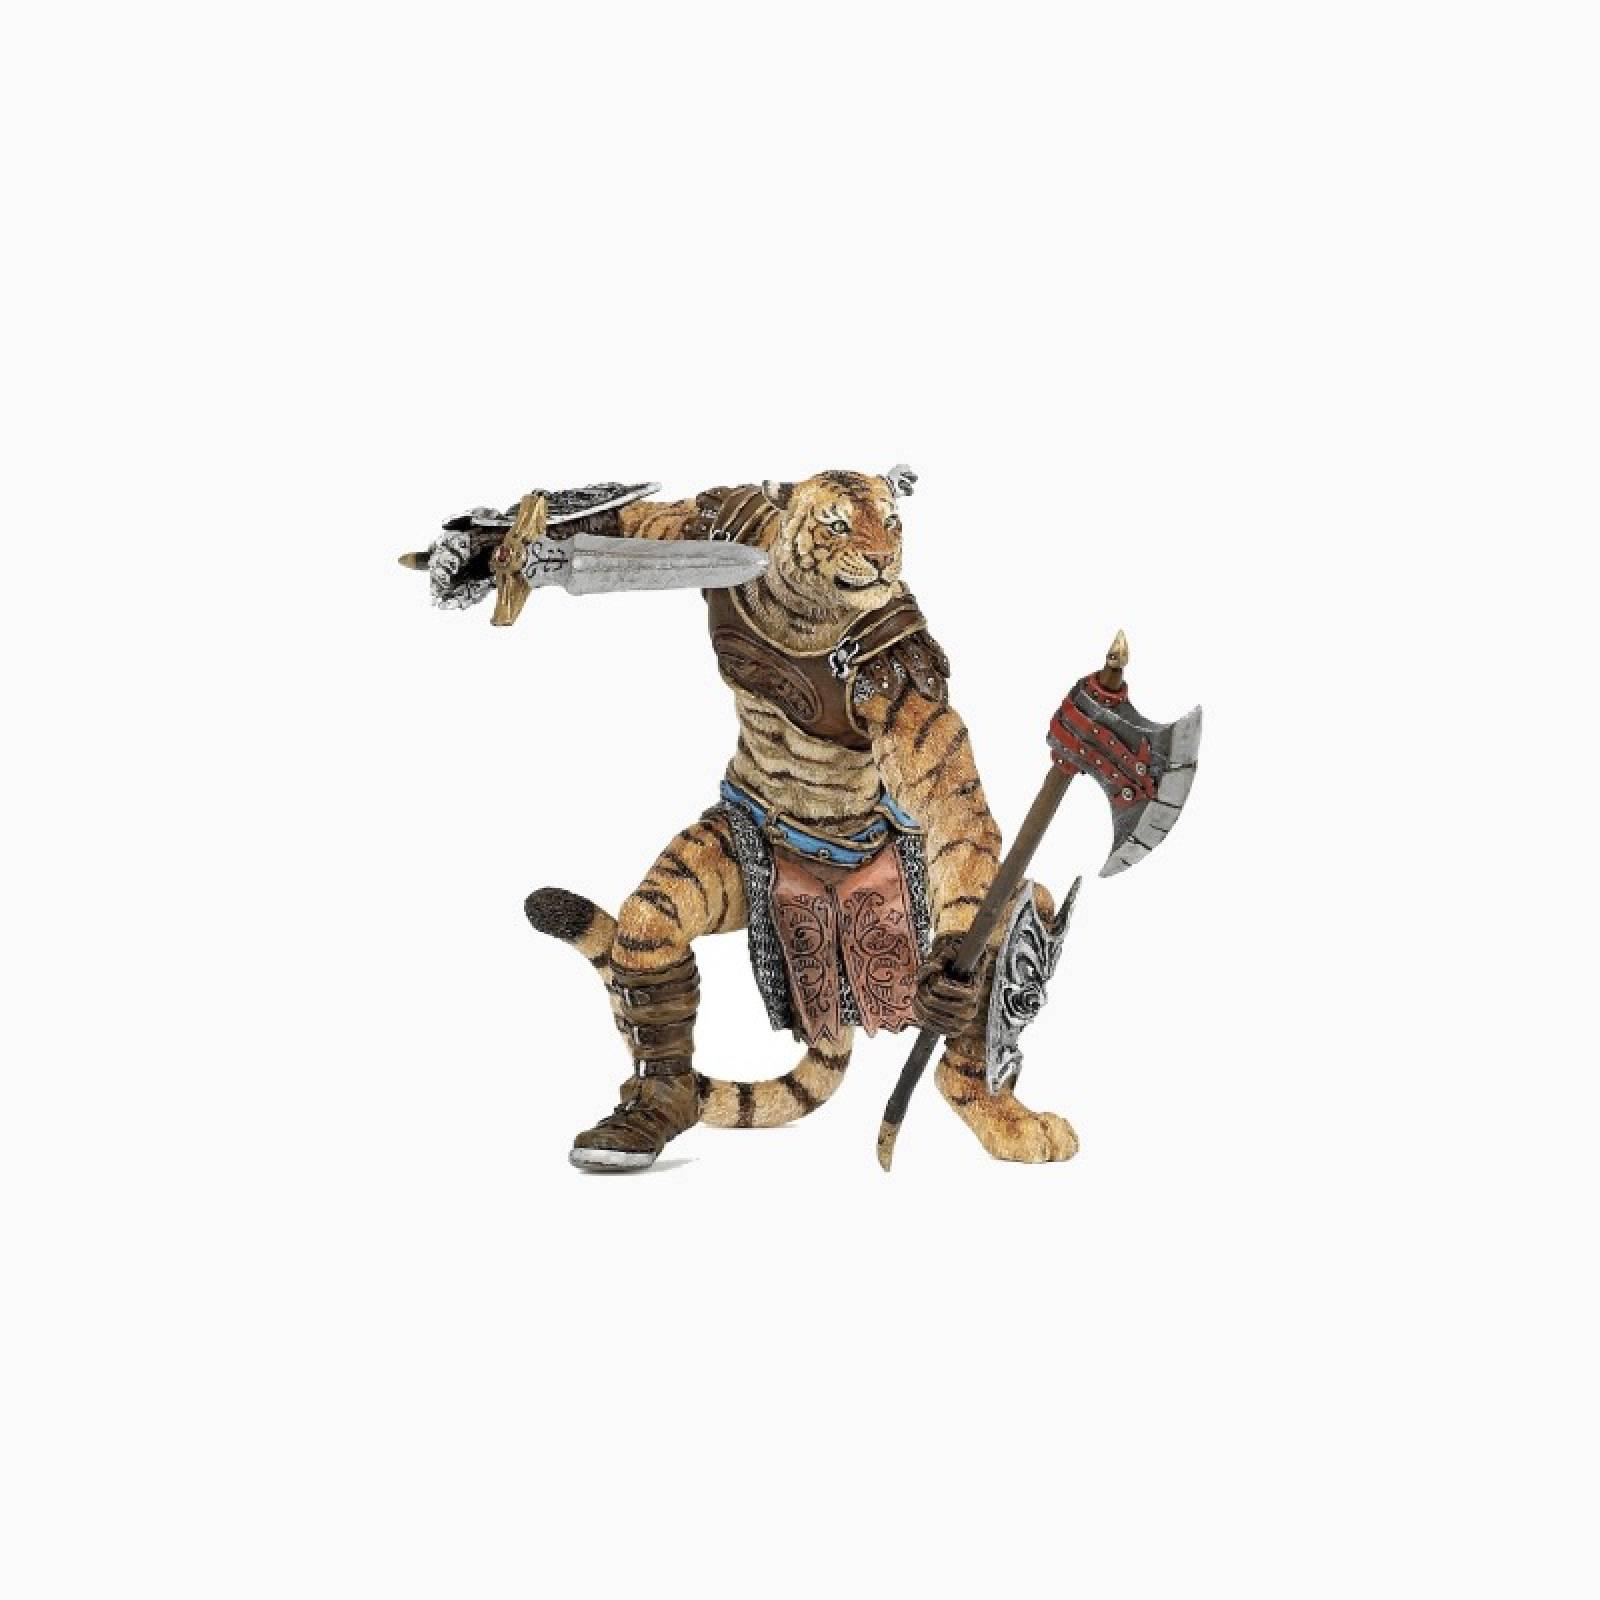 Tiger Mutant Warrior - Papo Fantasy Figure